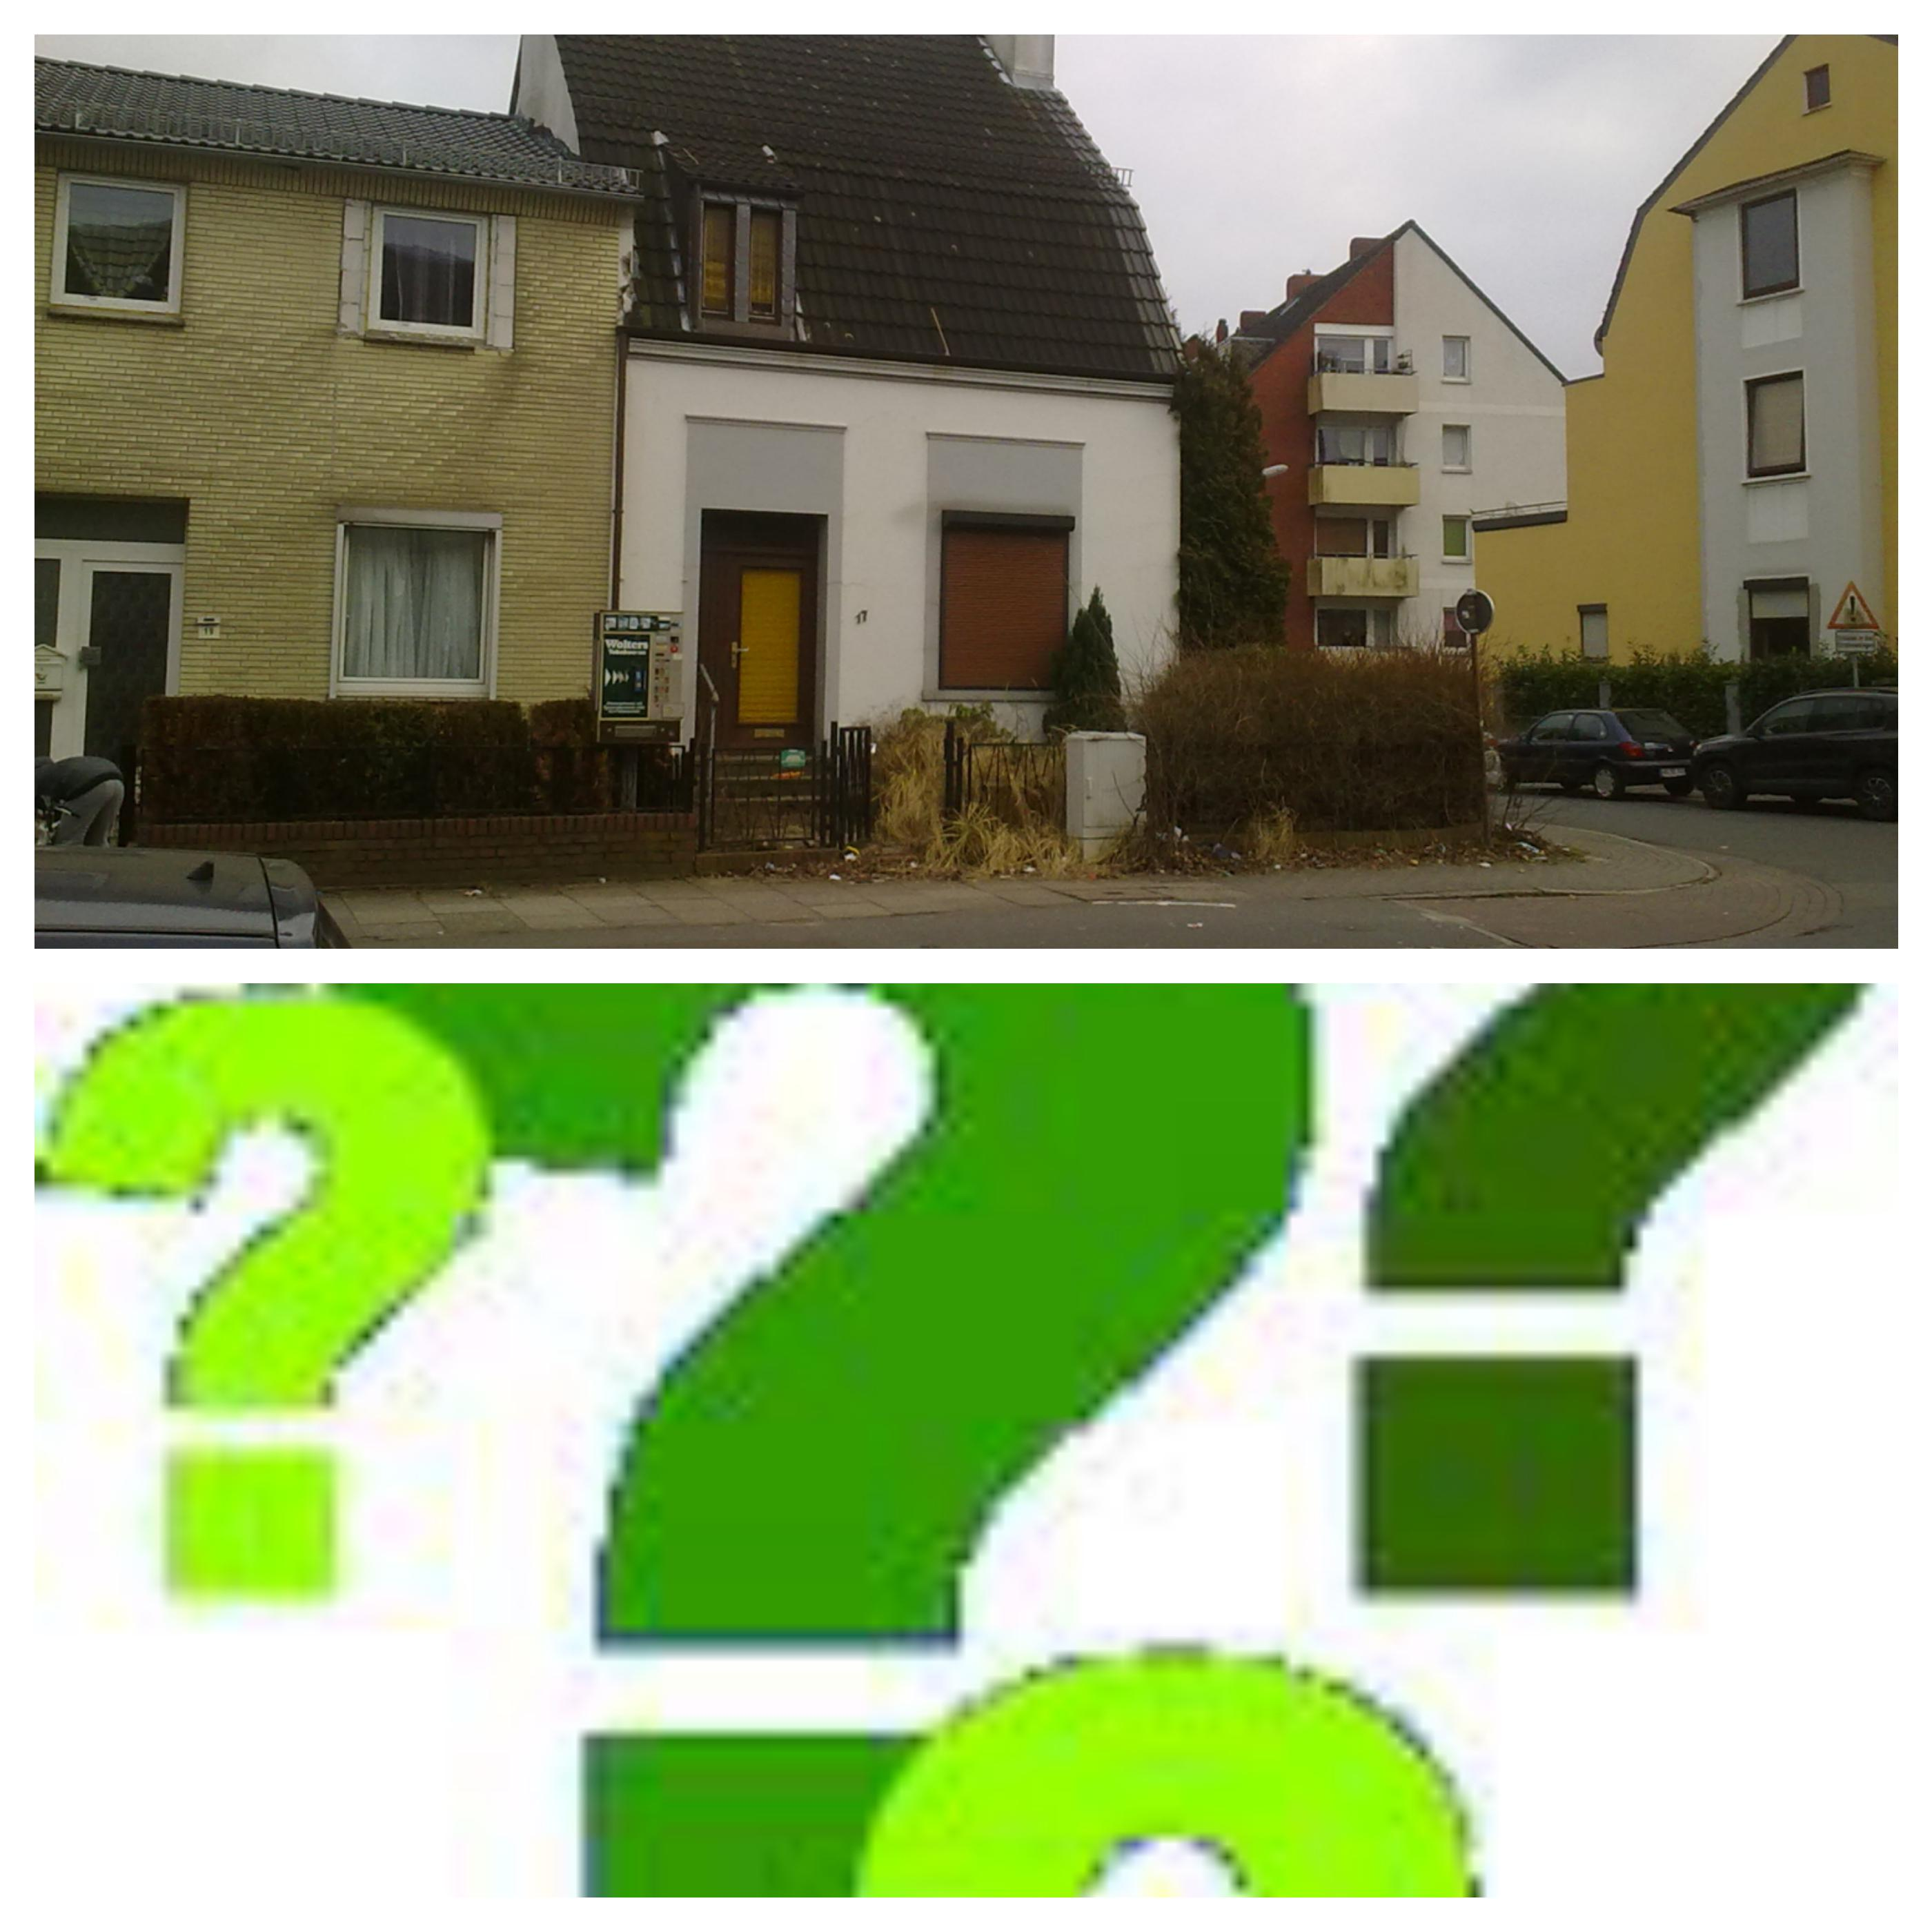 Schwarzer Weg 17